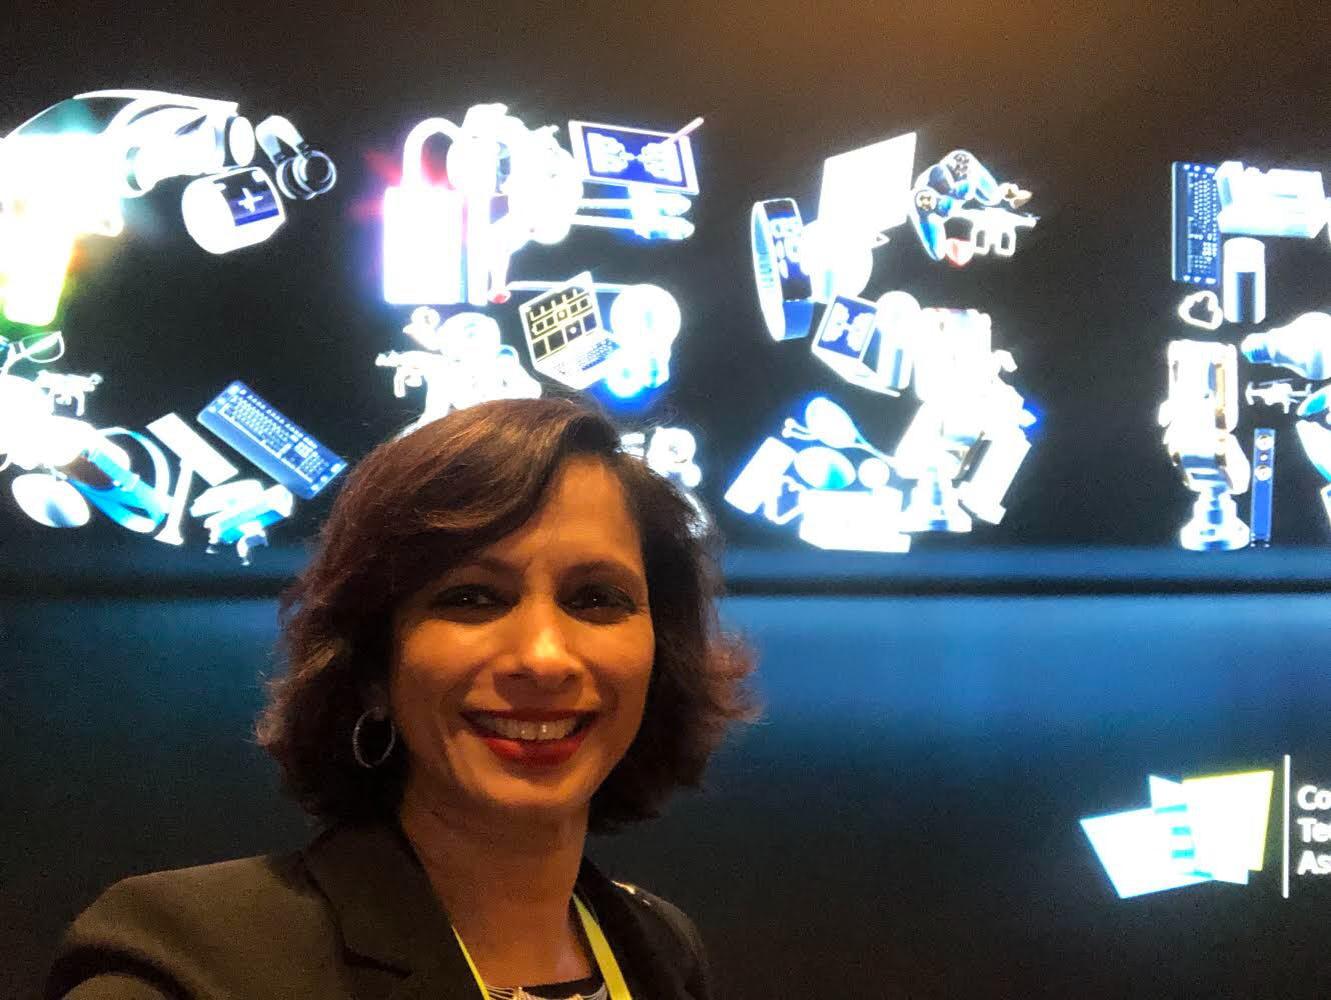 Seema Kumar for SEEMA, SEEMA Blog, CES, CES 2020. Consumer Electronics Show, Seema magazine, Seema network, Seema empowering Indian women leaders, SEEMA Tech